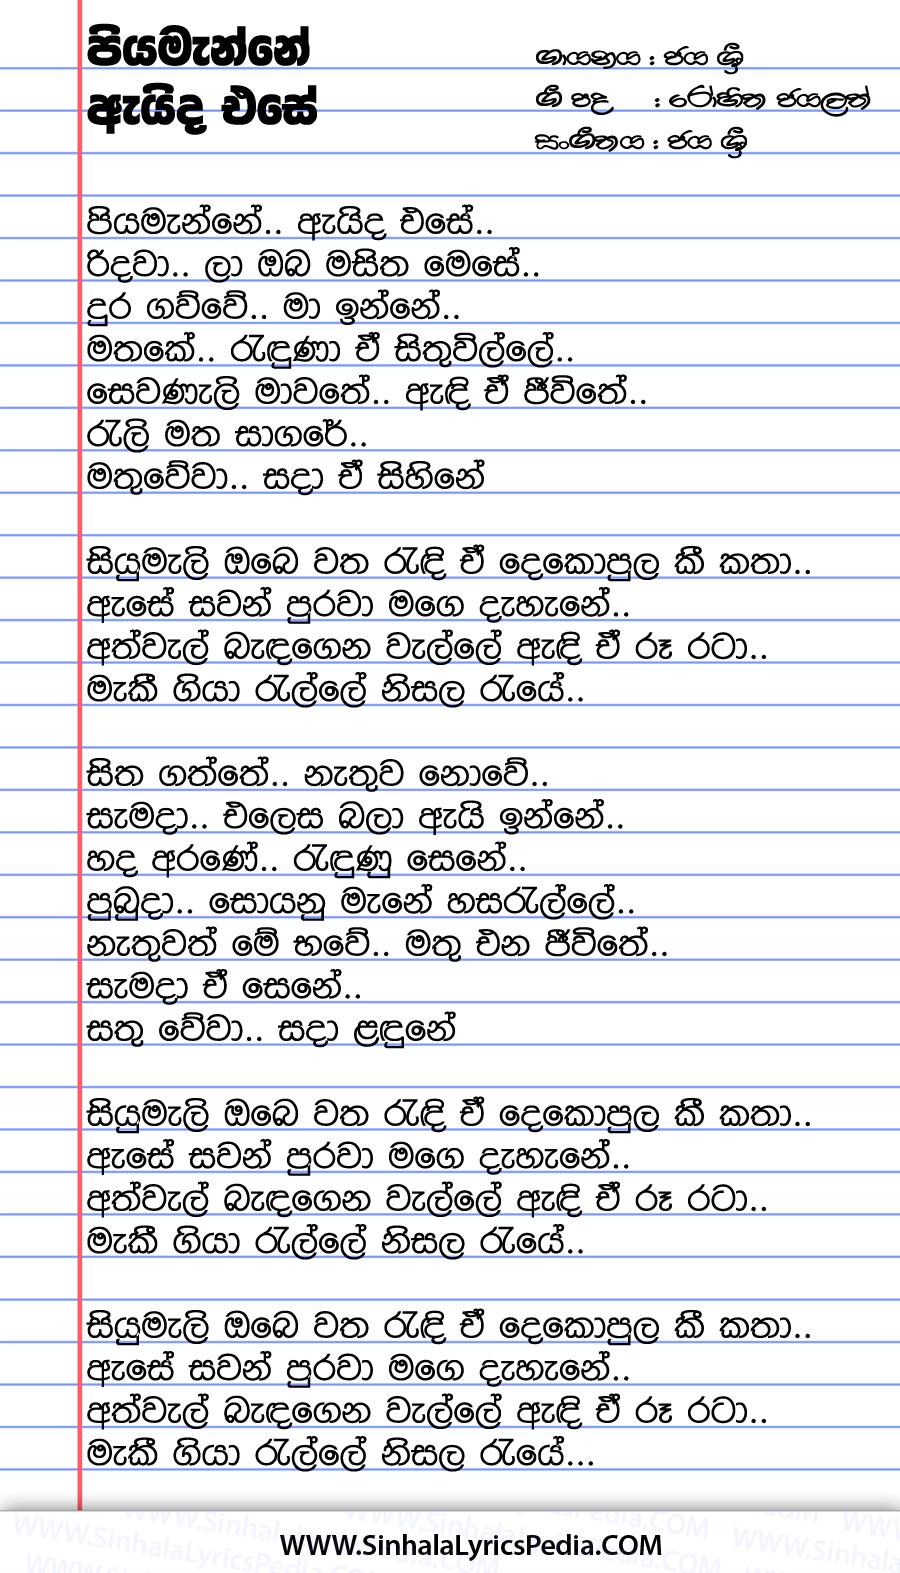 Piyamanne Aida Mese (Siyumali Obe Watha) Song Lyrics